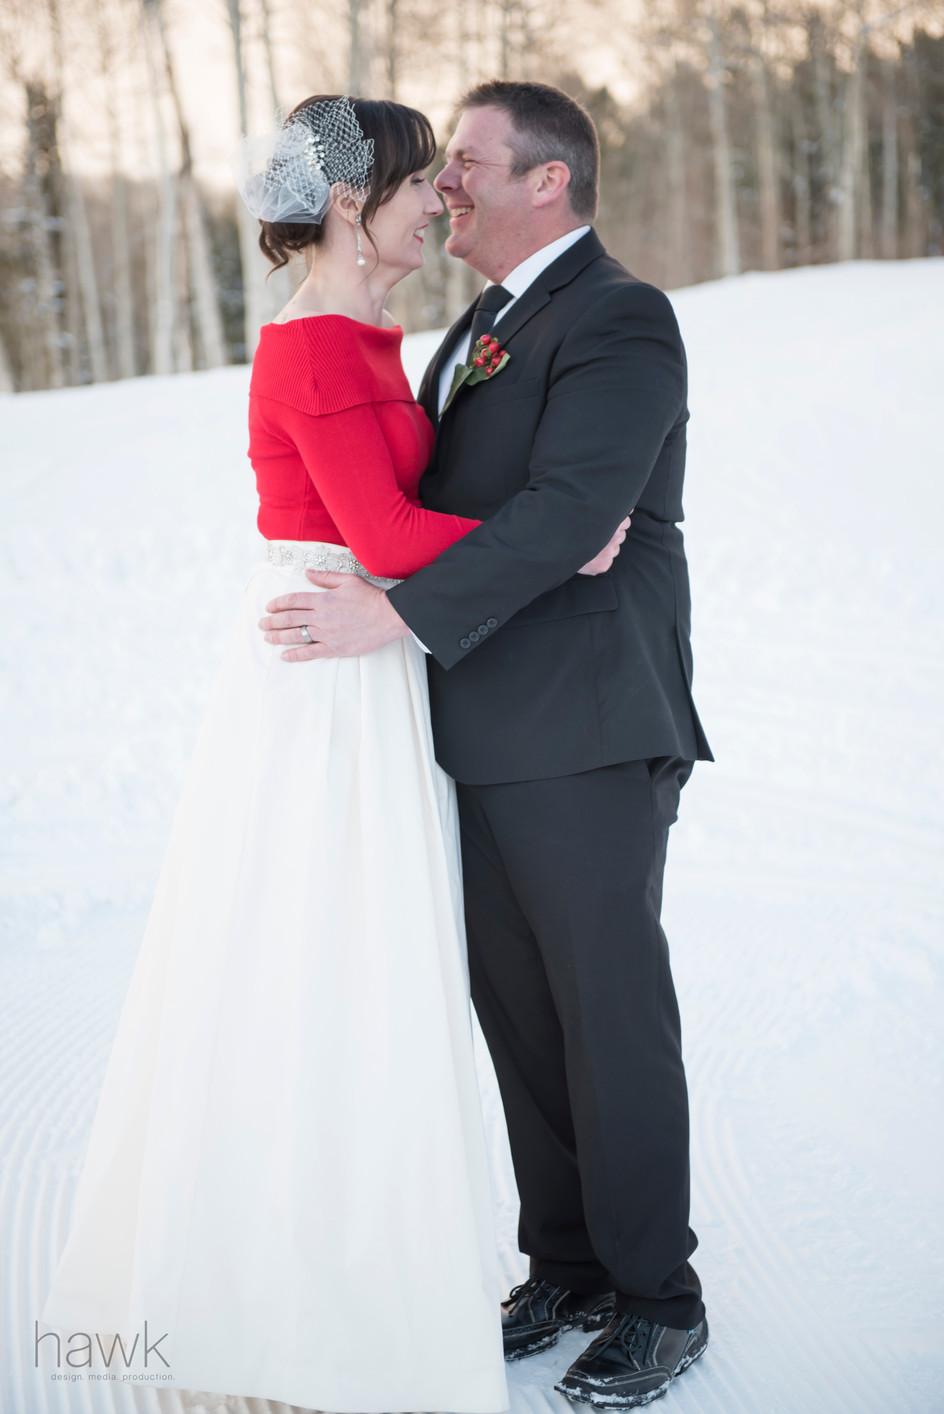 Jim + Alison's Beaver Creek Wedding